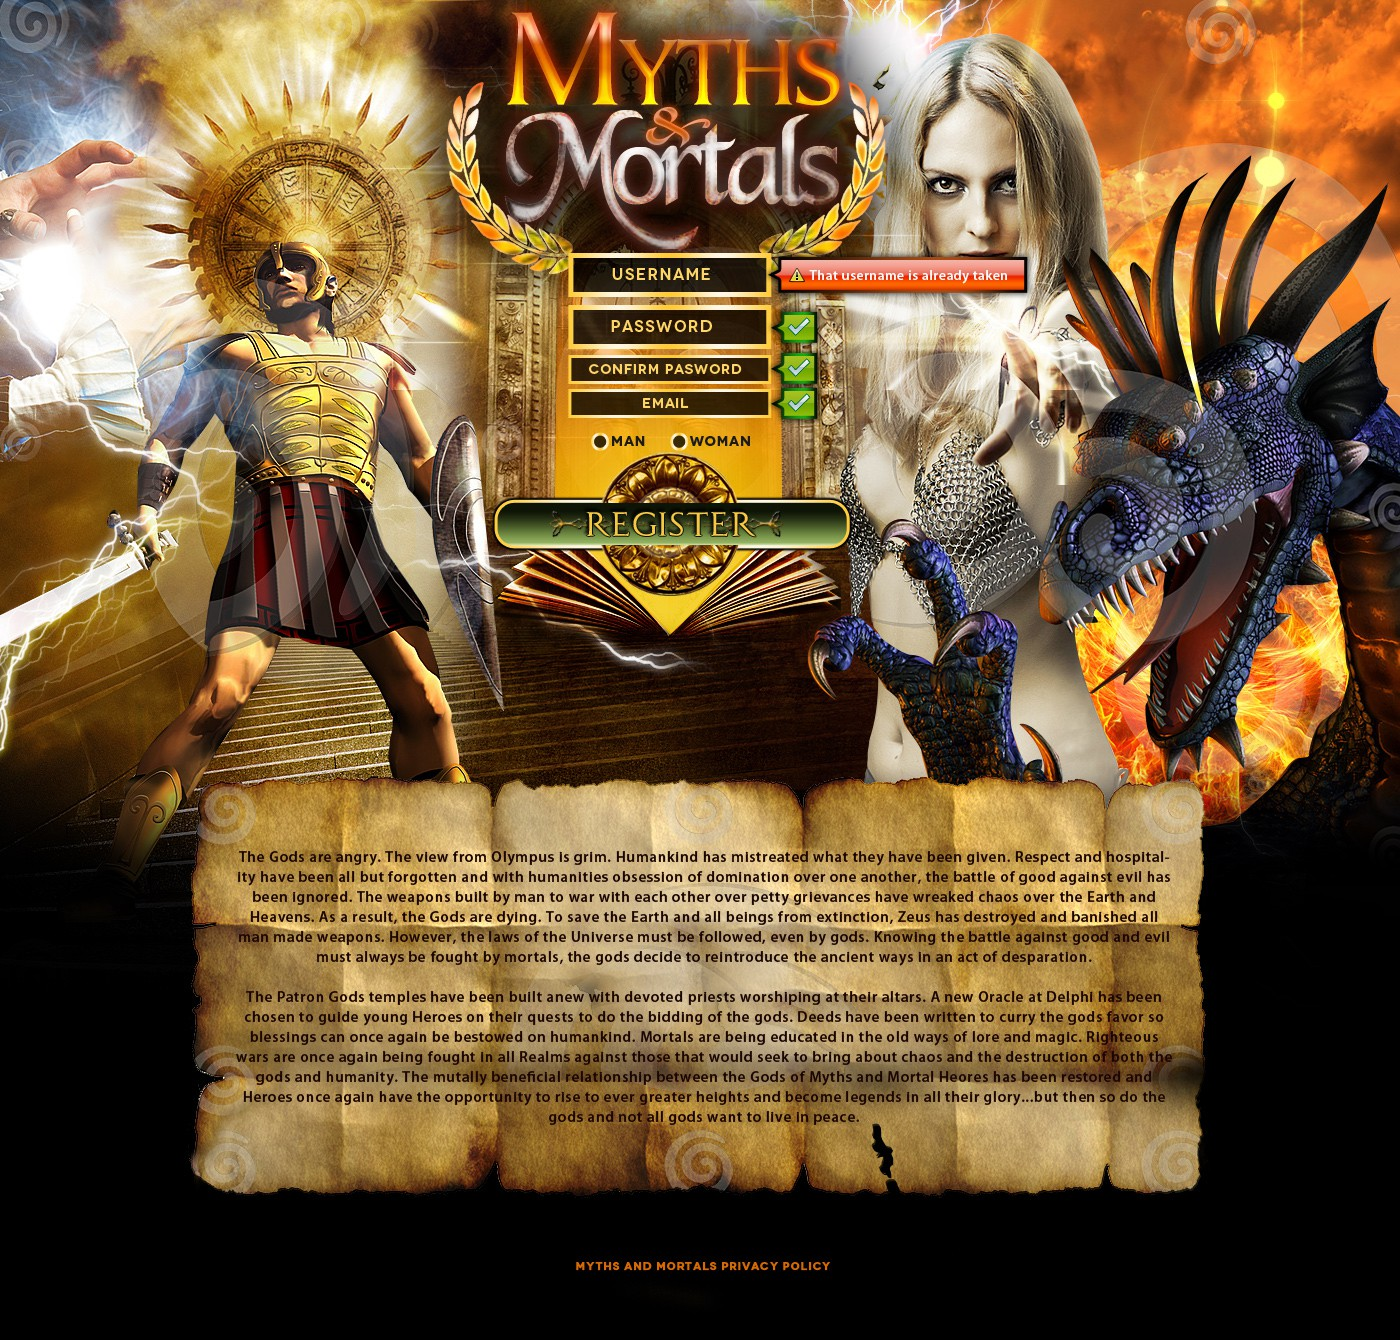 website design for Myths And Mortals